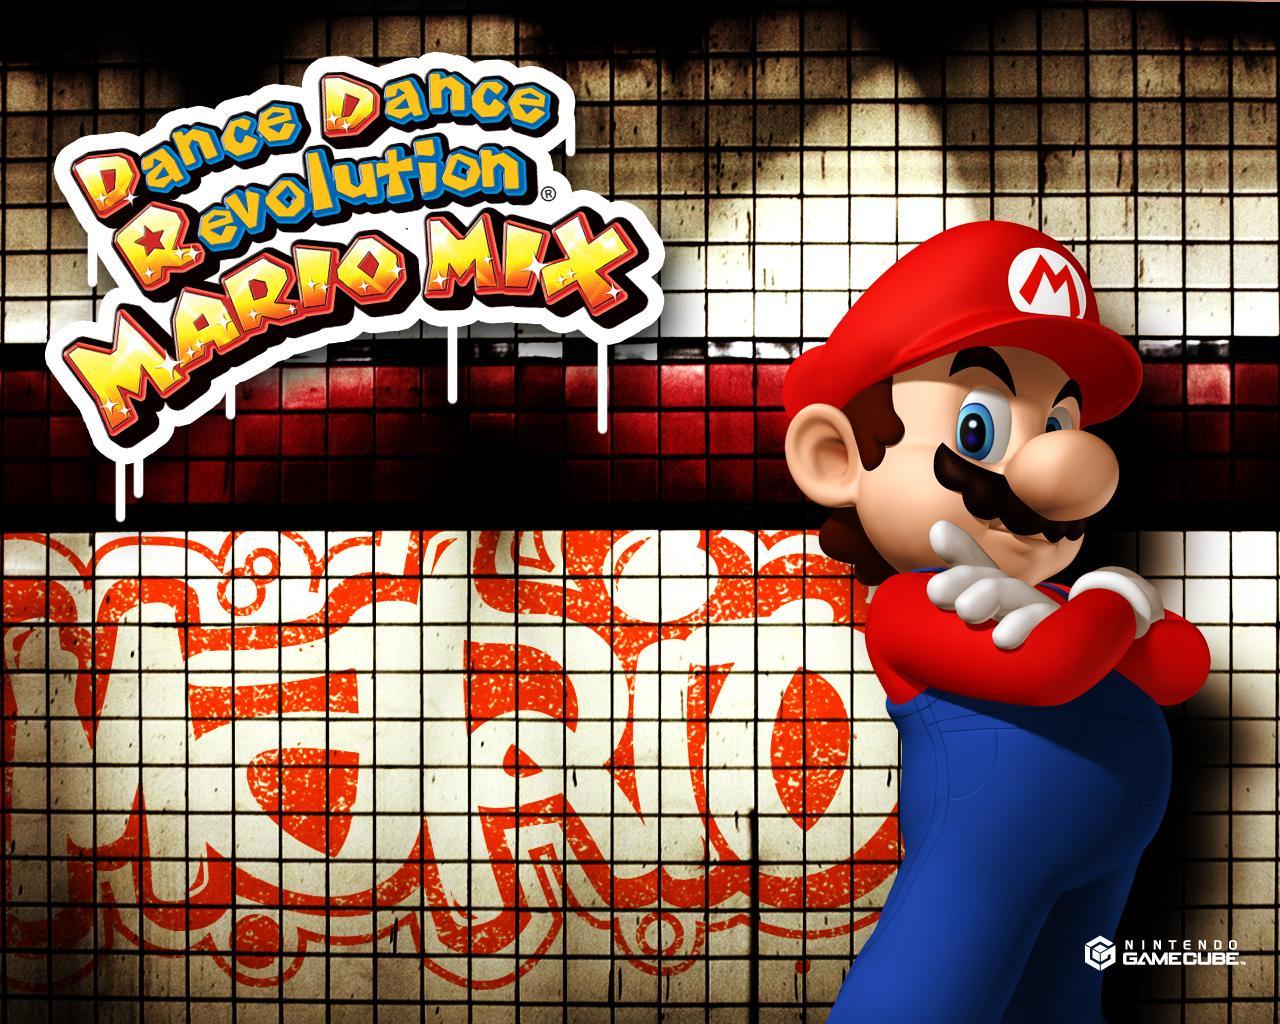 Super Mario Desktop Wallpaper From Gamecube Games